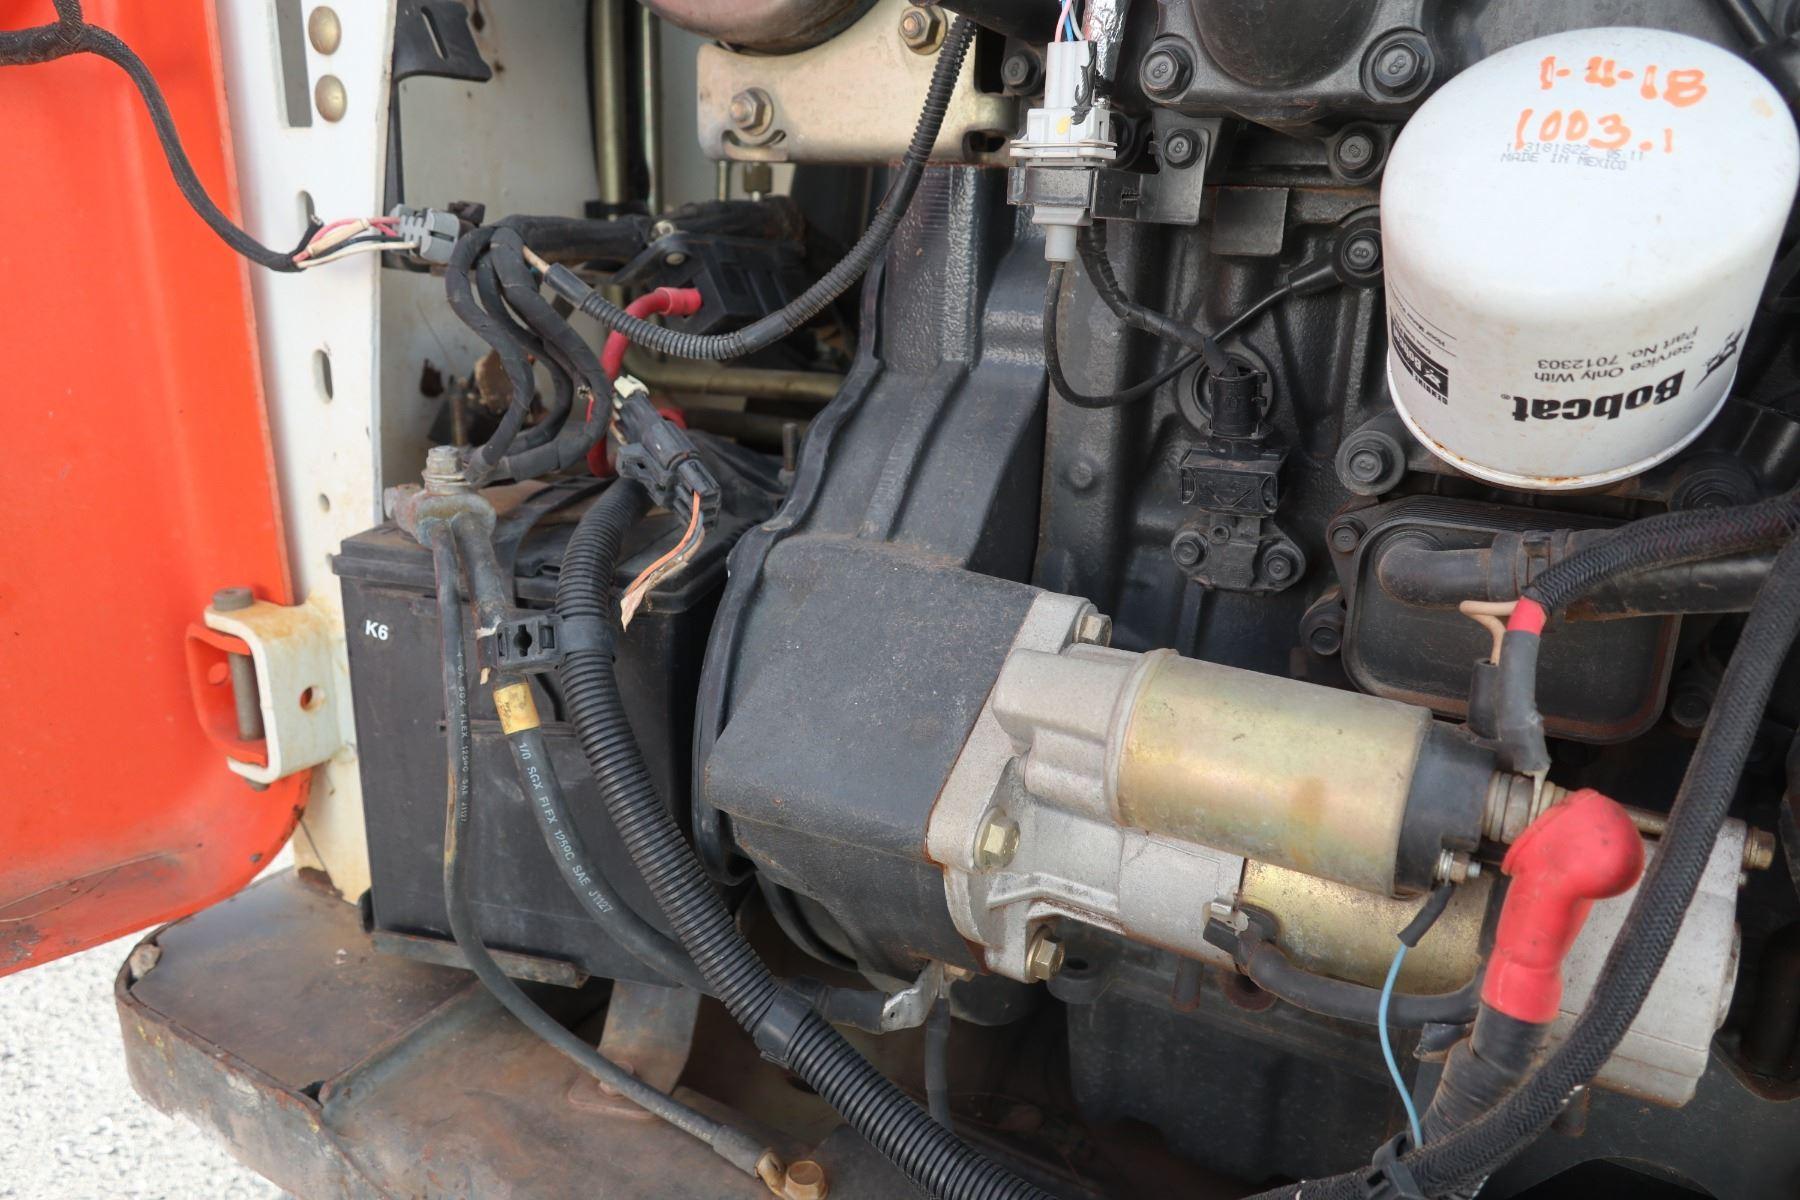 2015 Bobcat S570 Skid Steer Loader 1143 Hours (Runs,Drives